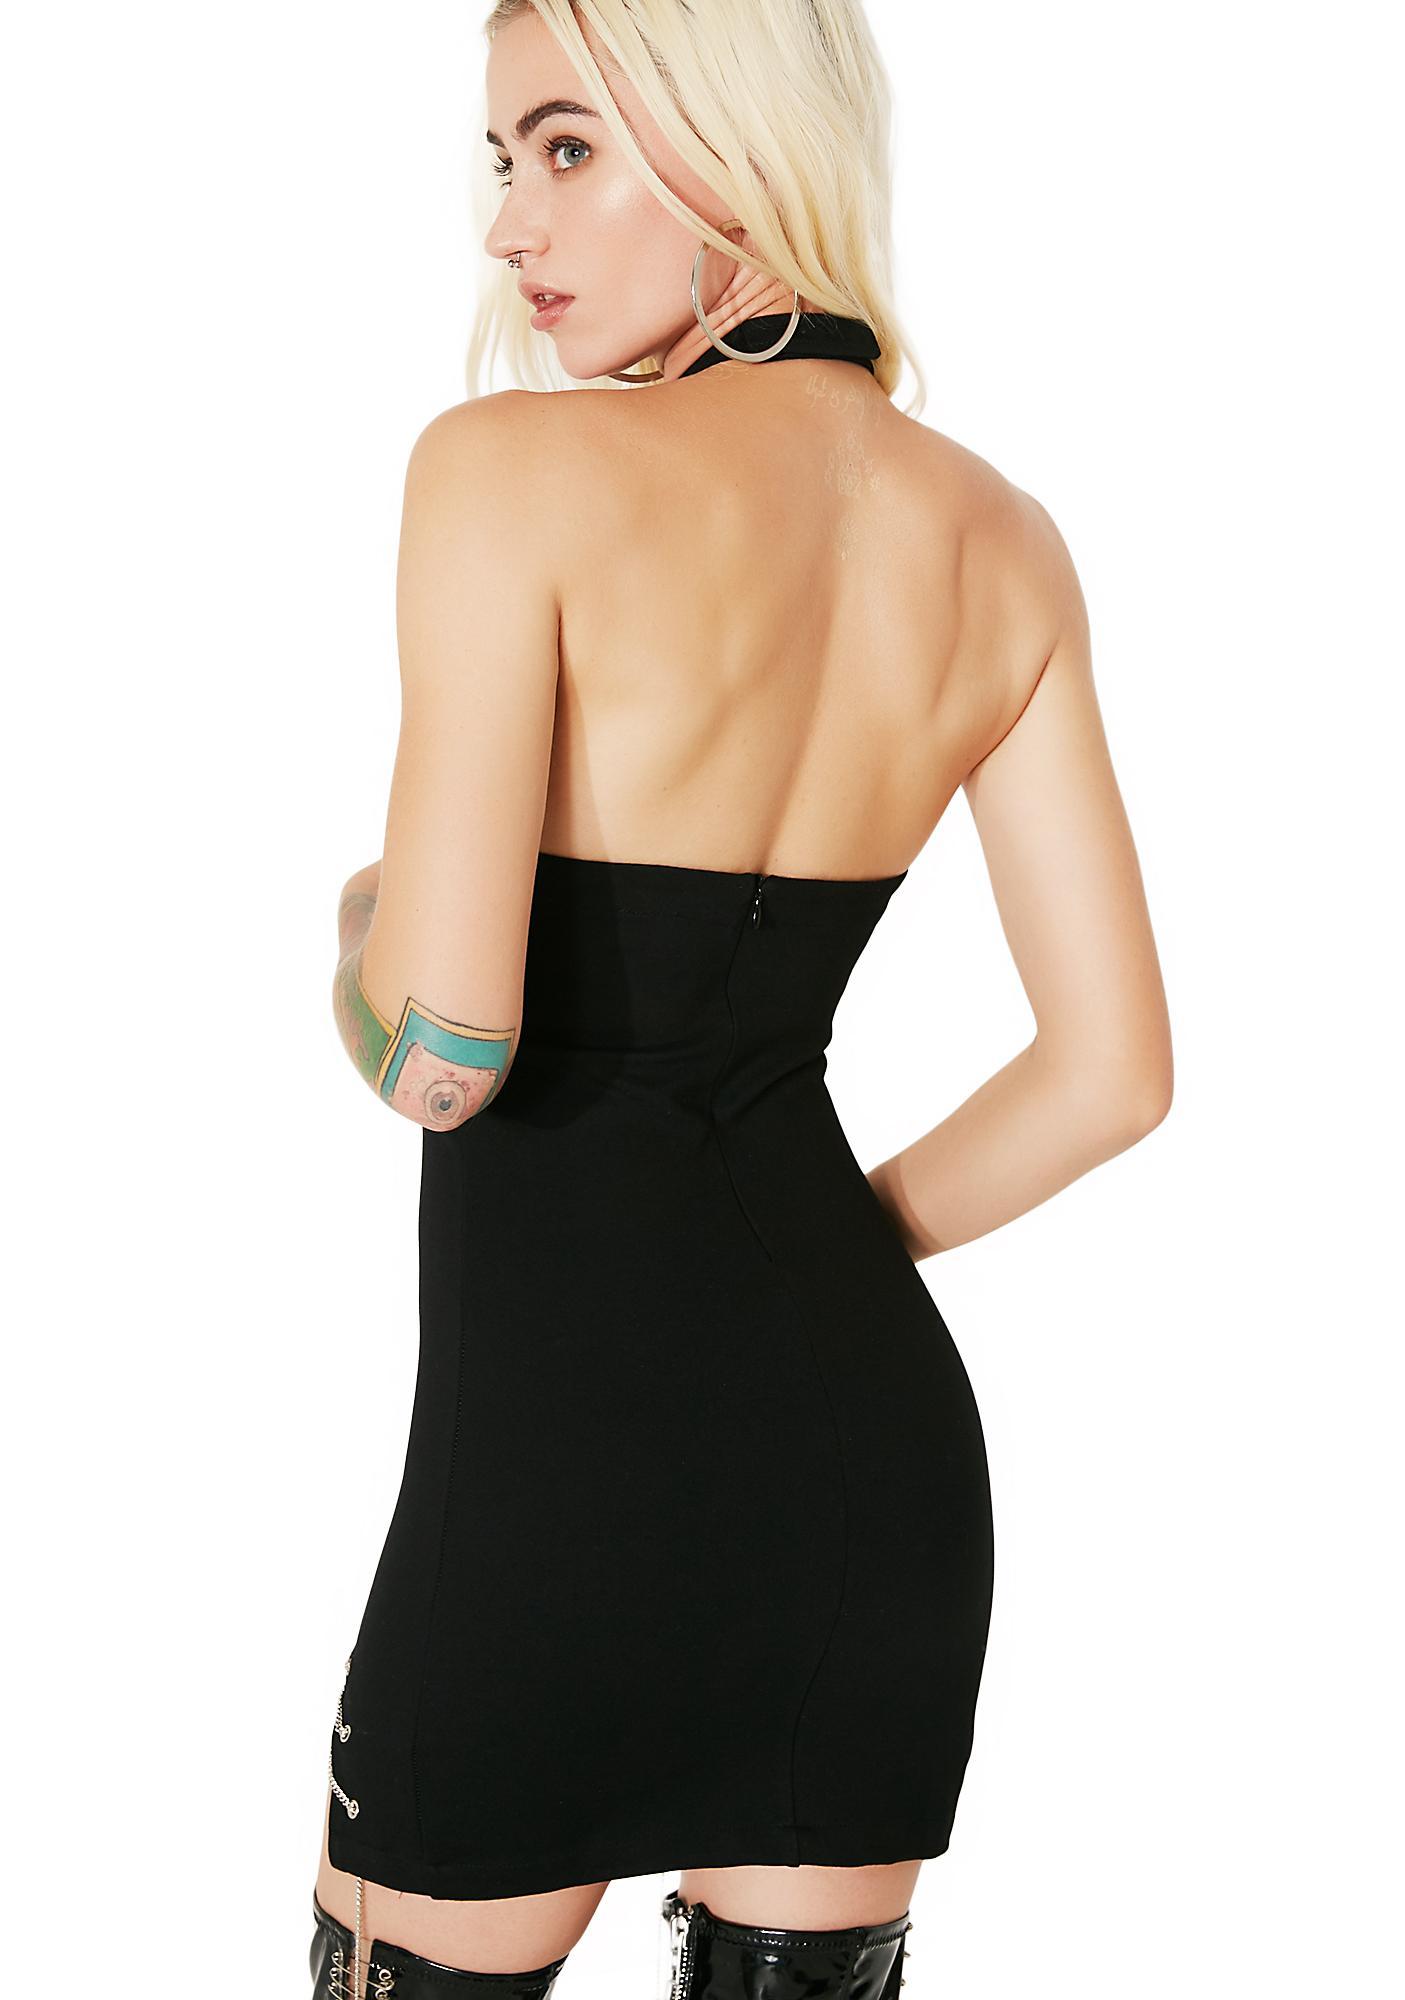 Hardware LDN Cougar Town Short Dress